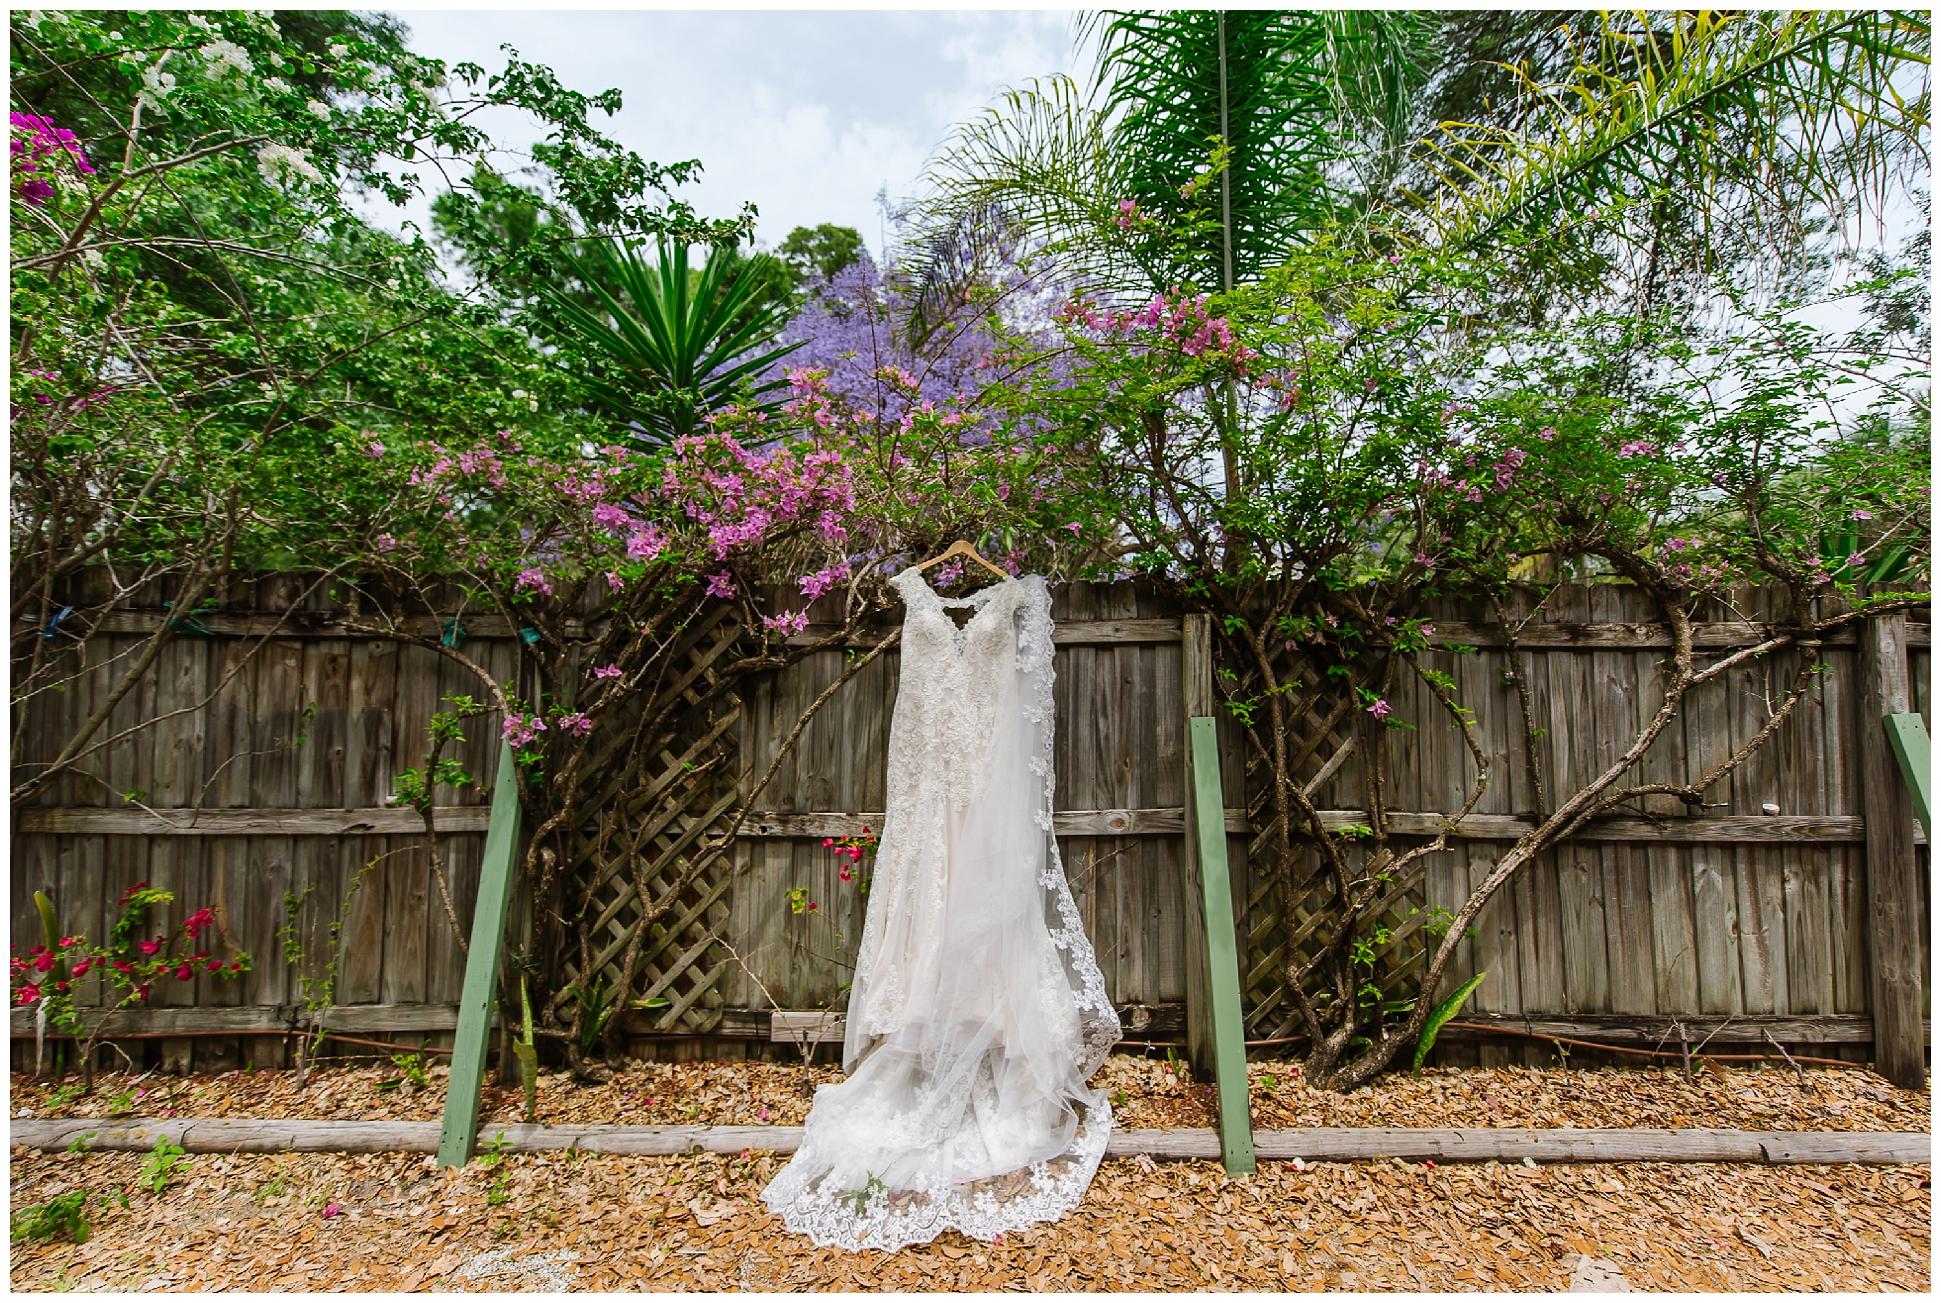 st-pete-wedding-photographer-italian-romance-theme-rustic-flower-crown_0373.jpg